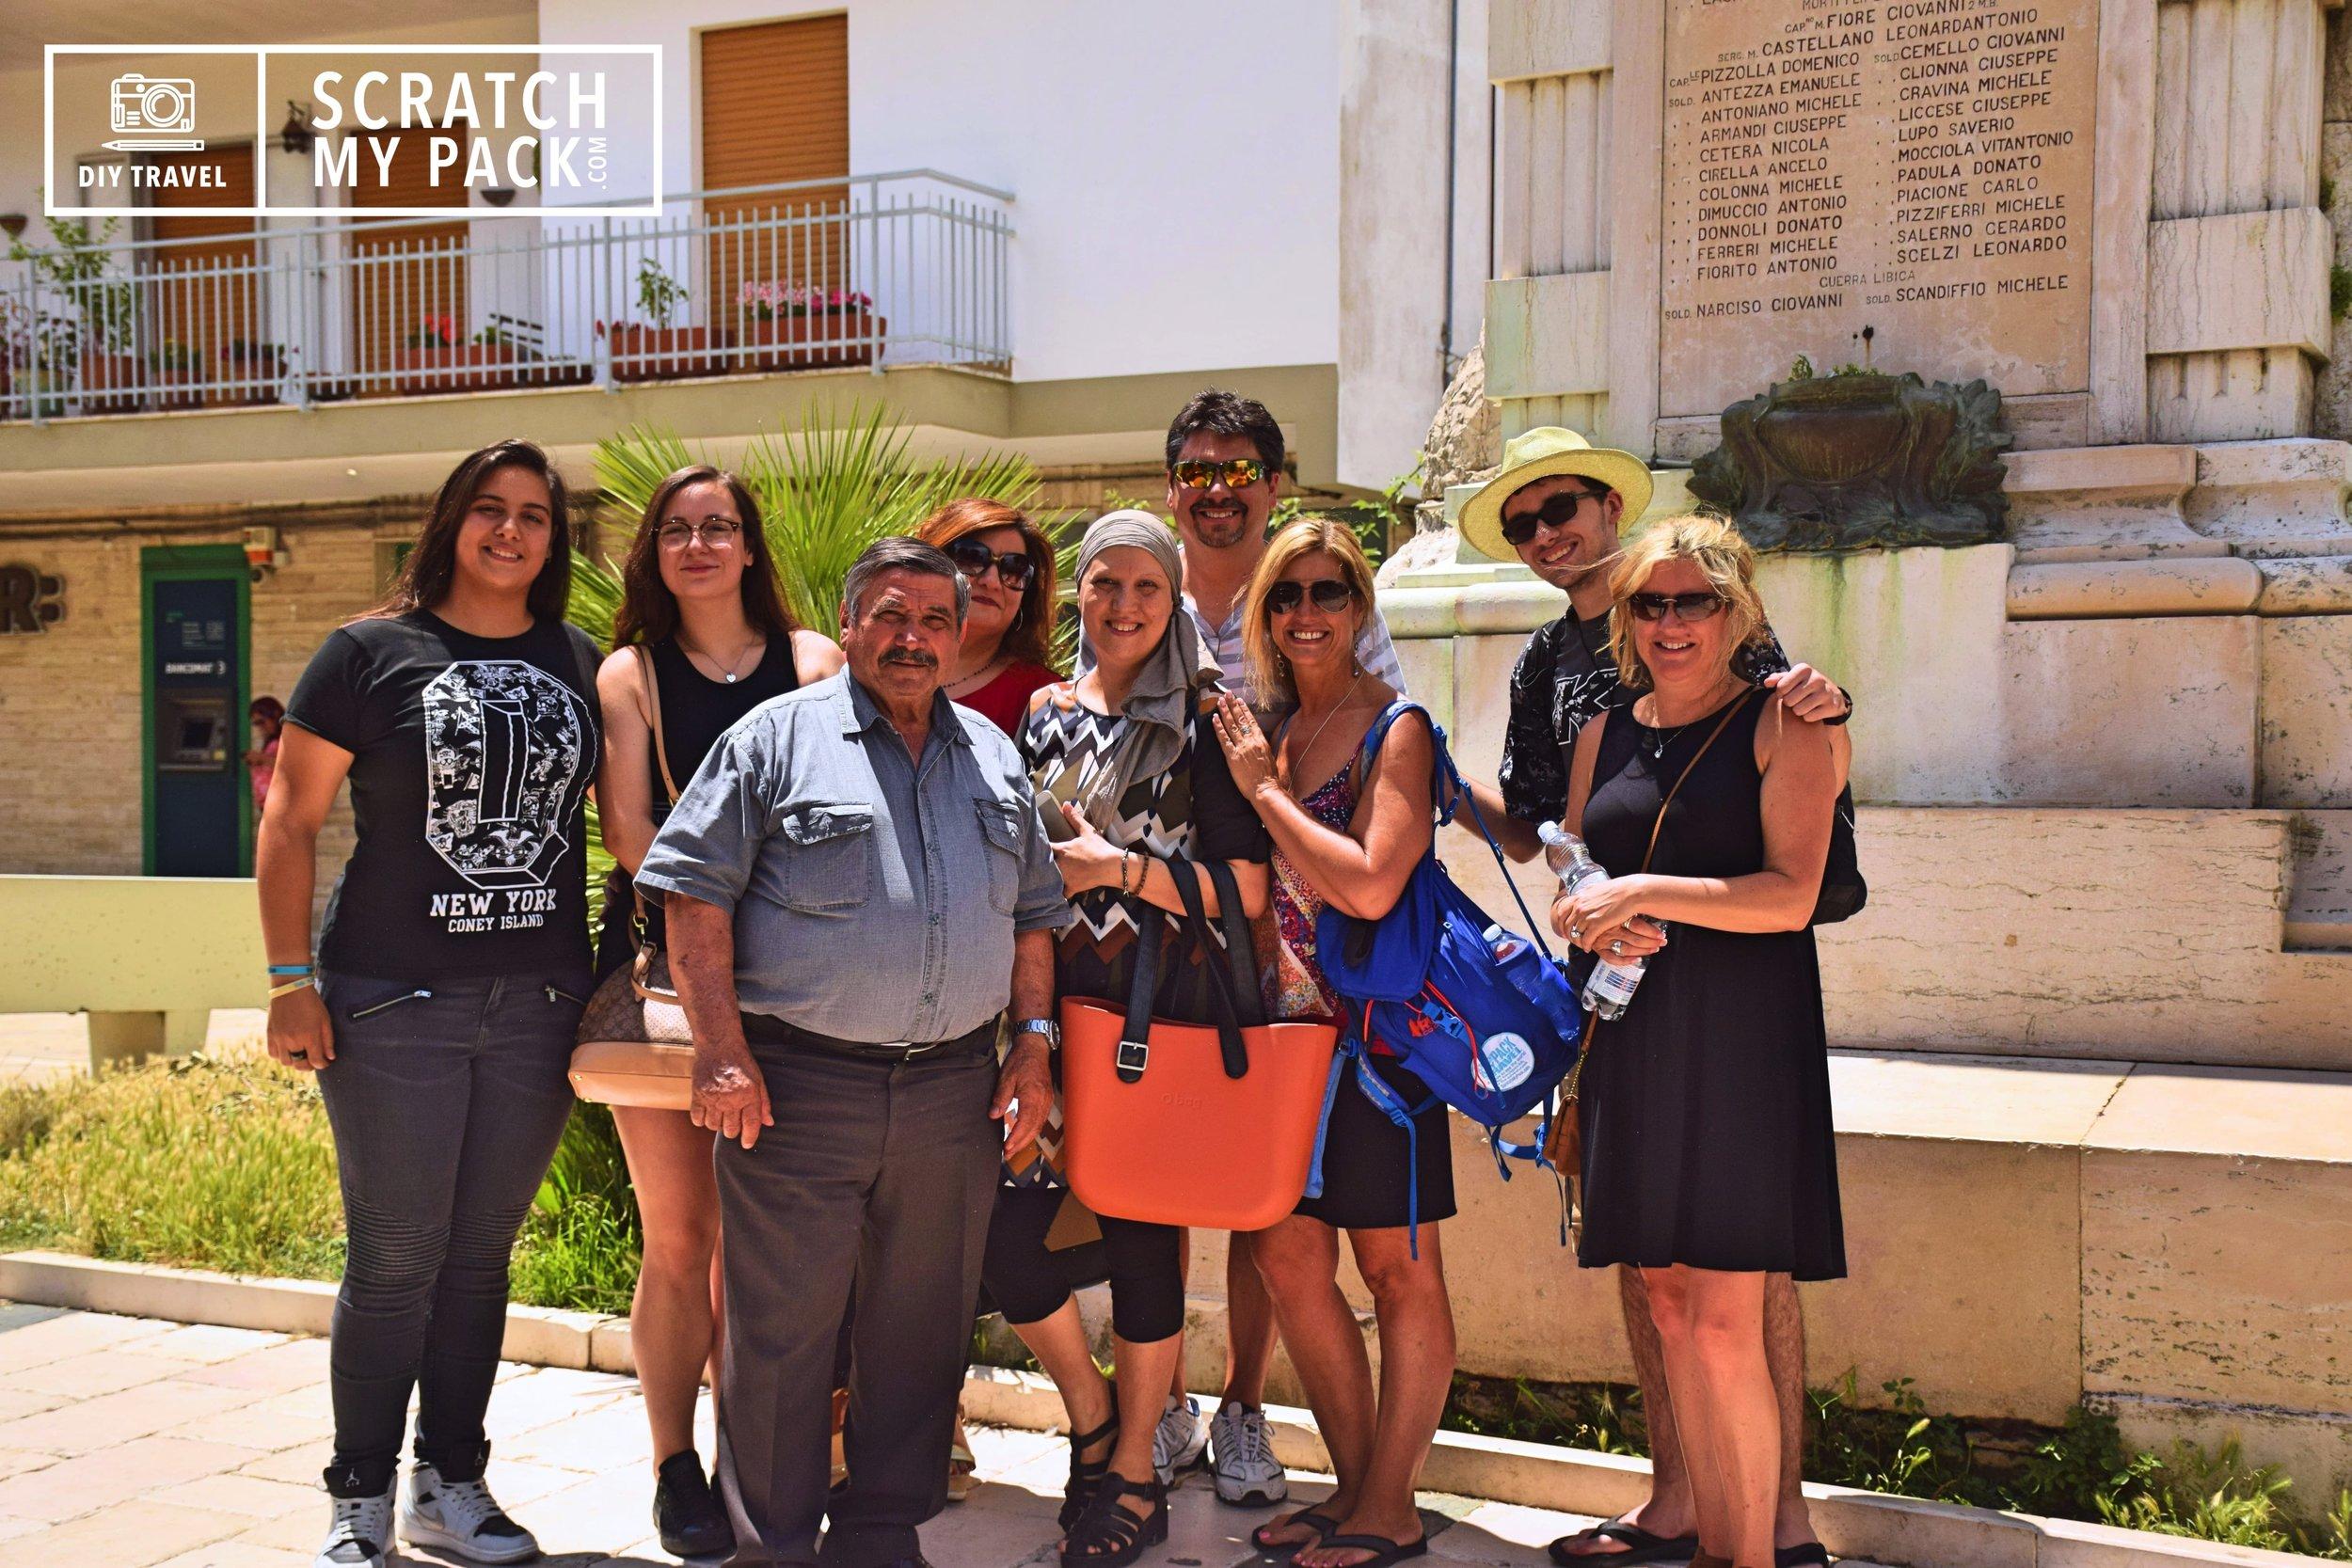 (Left to Right) Giulia, Giulia, Giuseppe, Antonella, Rosa, David, Lisa, Preston, & Jennifer